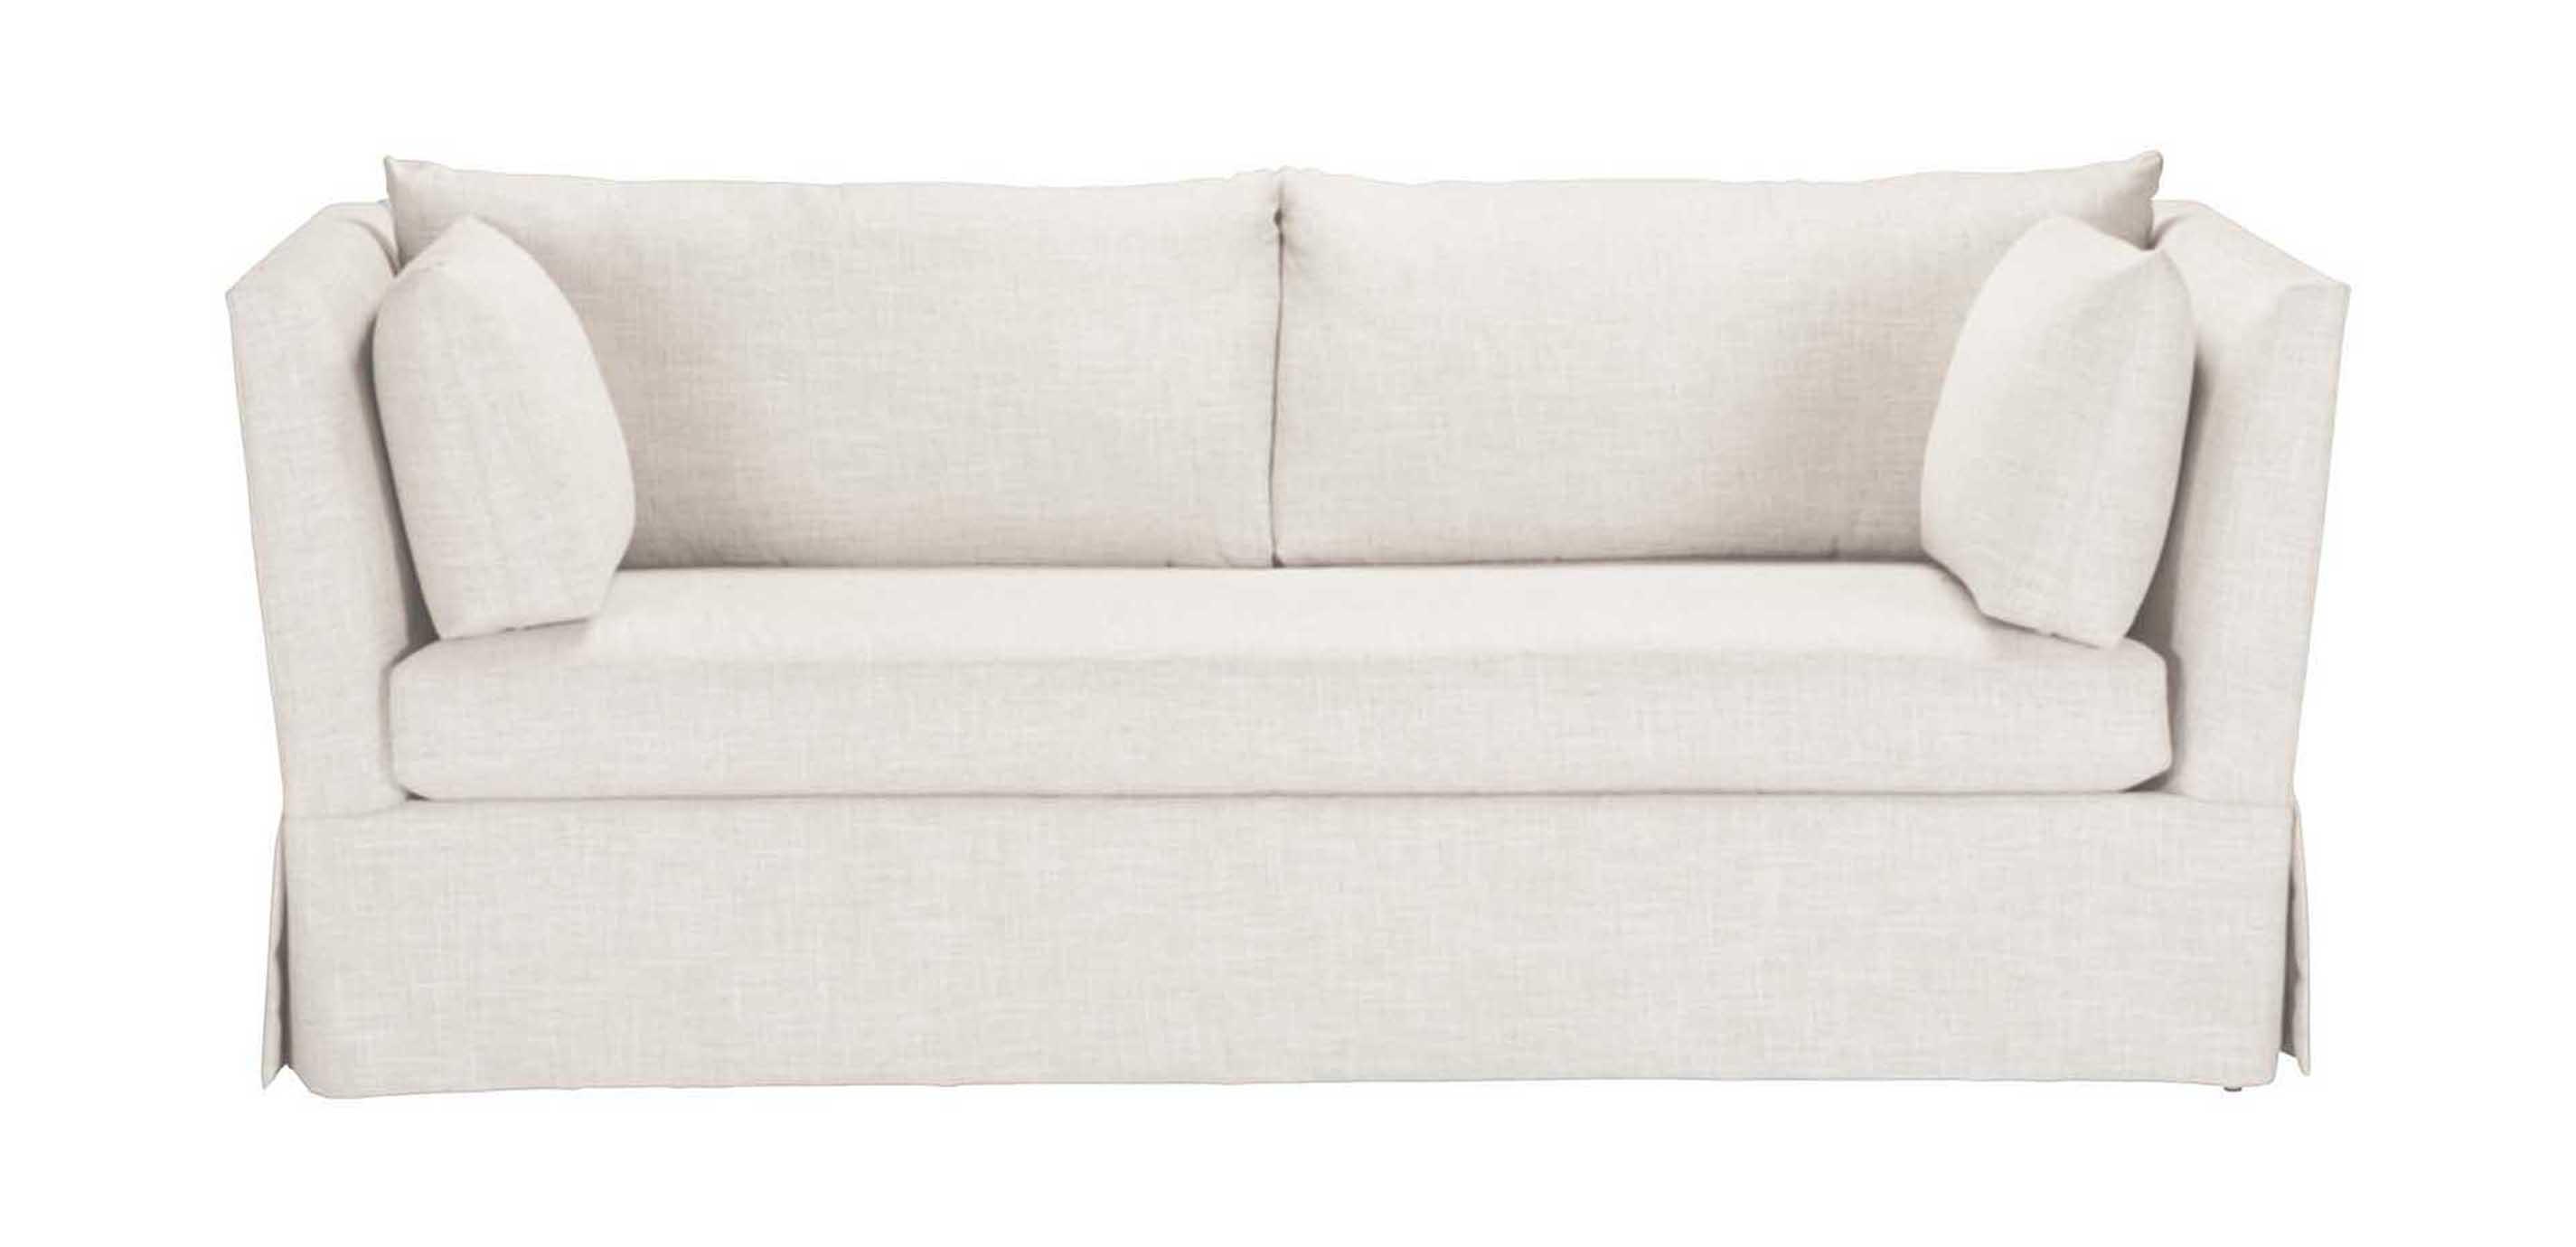 Averill Shelter Arm Sofa Loose Pillow